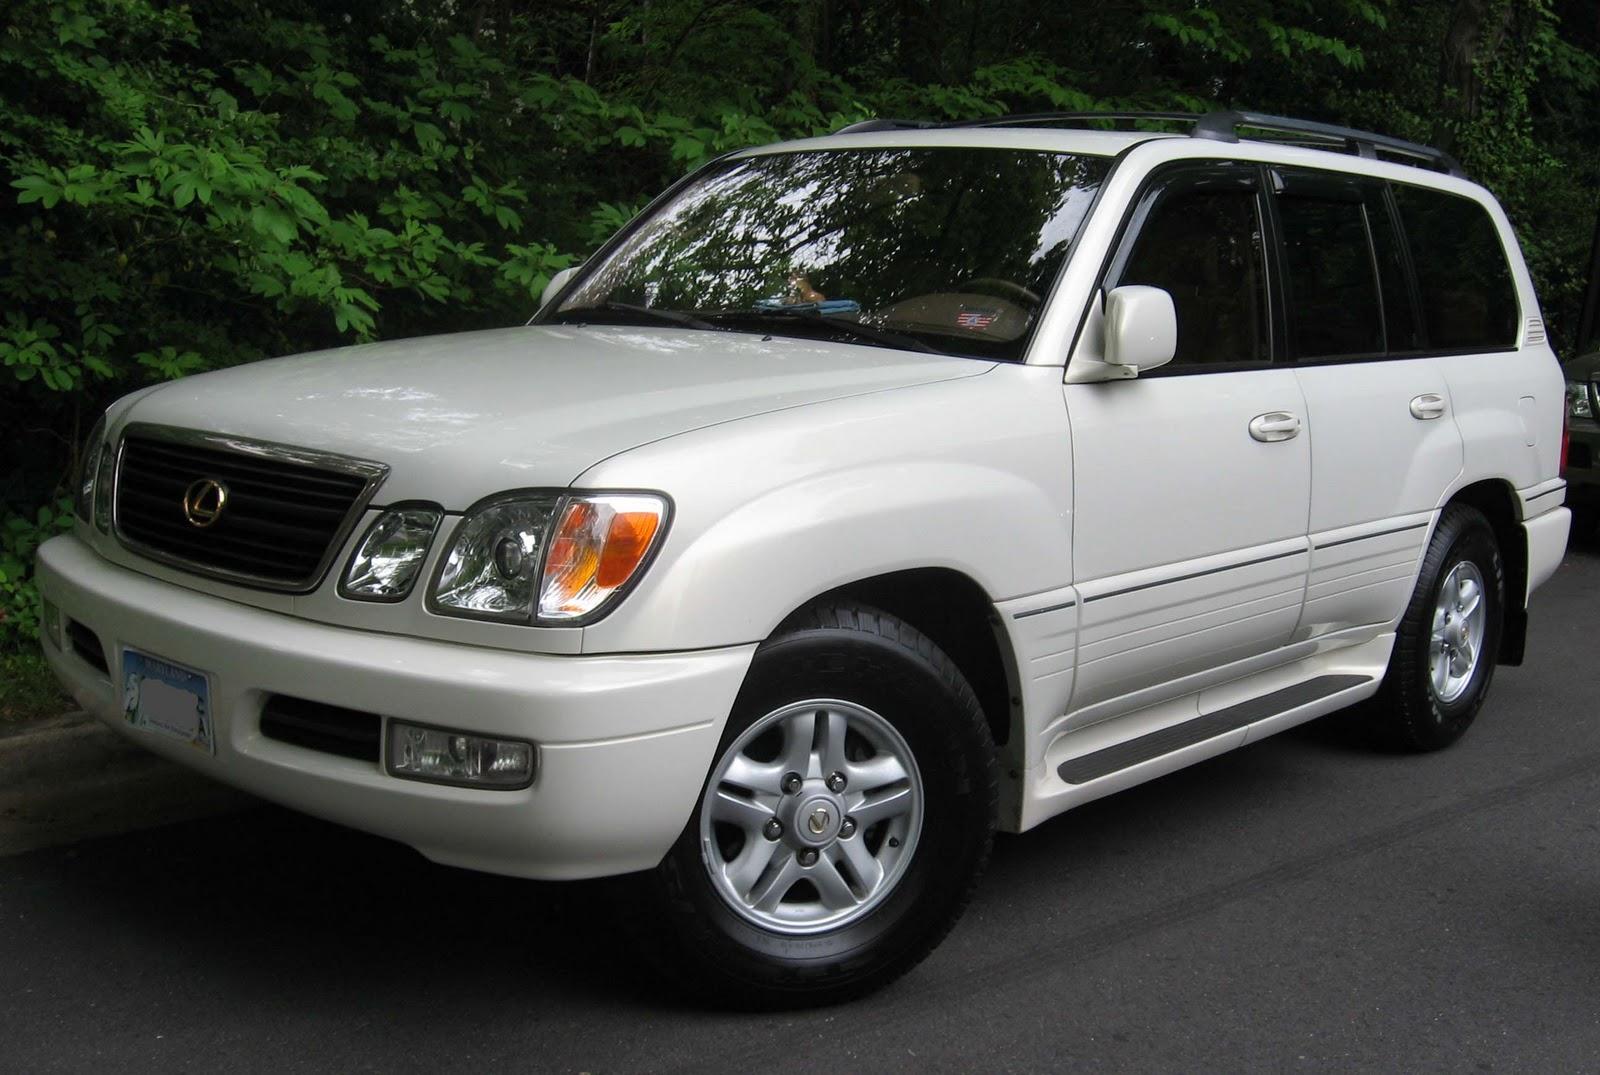 http://3.bp.blogspot.com/_yD64oqmpw58/TT6y67l8BeI/AAAAAAAAAEo/_4wlIXrxycQ/s1600/Lexus-LX-470+-600+x+400.jpg